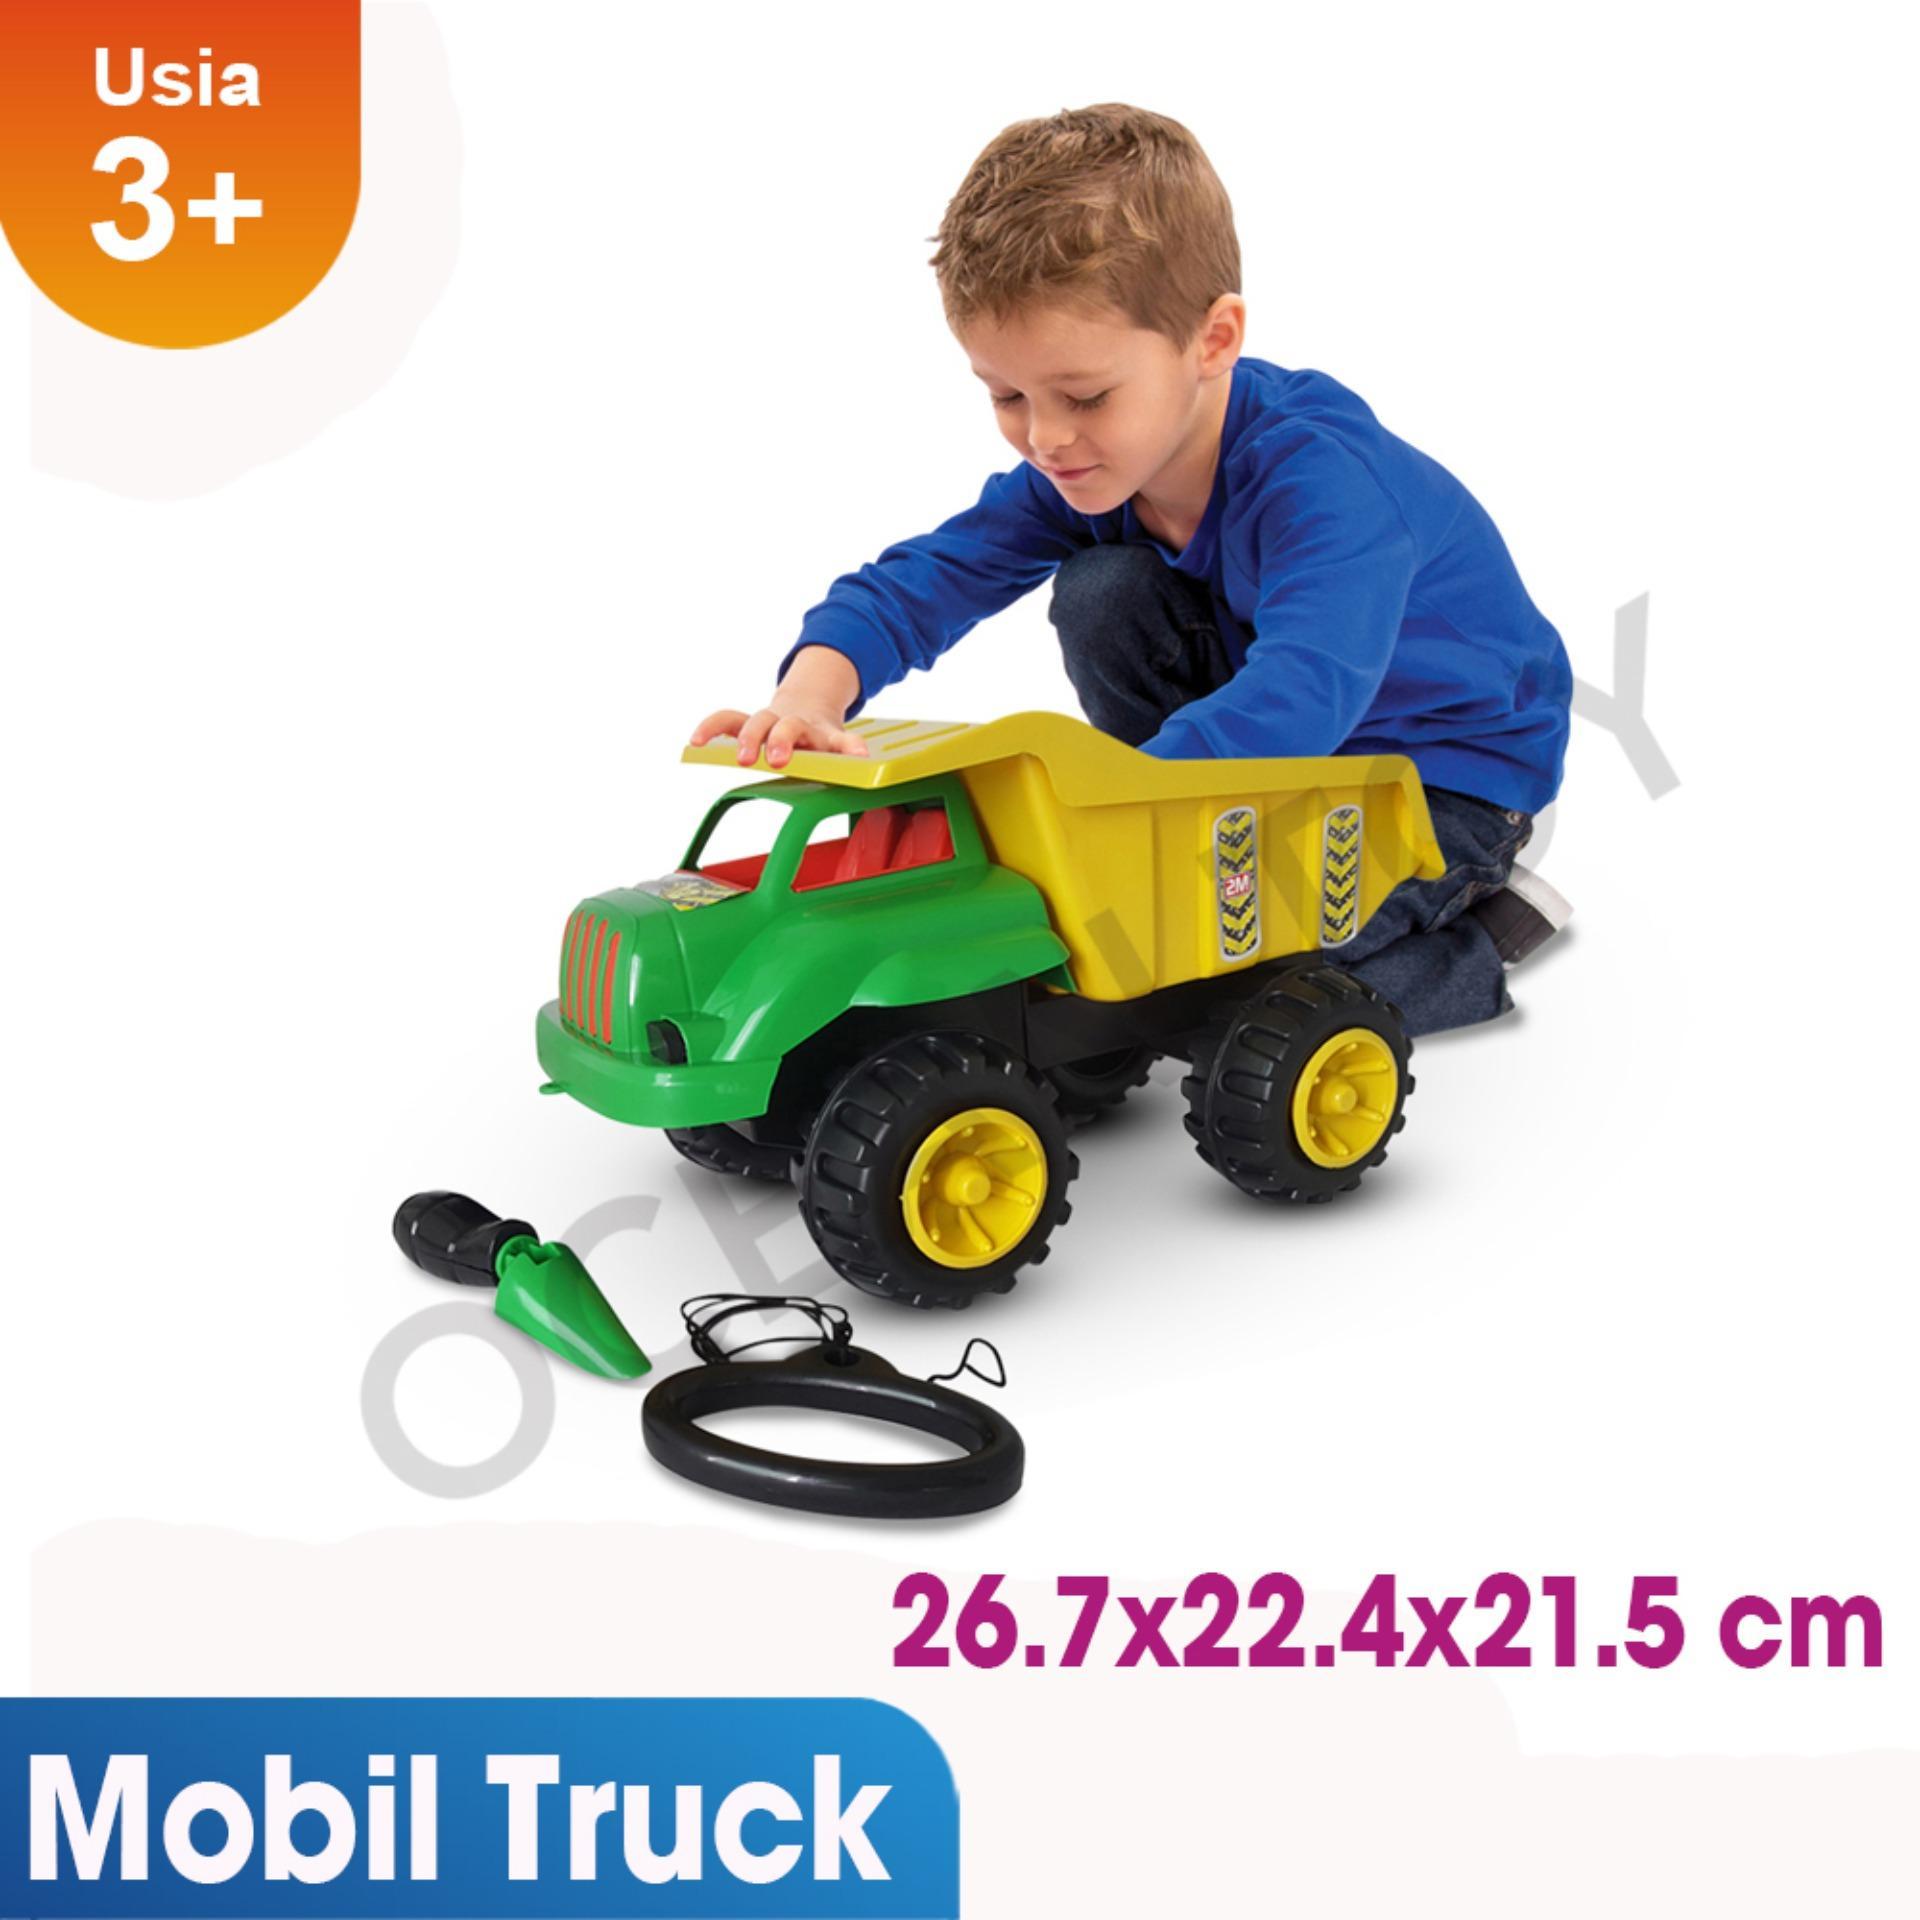 Toko Ocean Toy Yotta Mobil Truck Pasir Crocodile Mainan Anak Crd Multicolor Di Banten